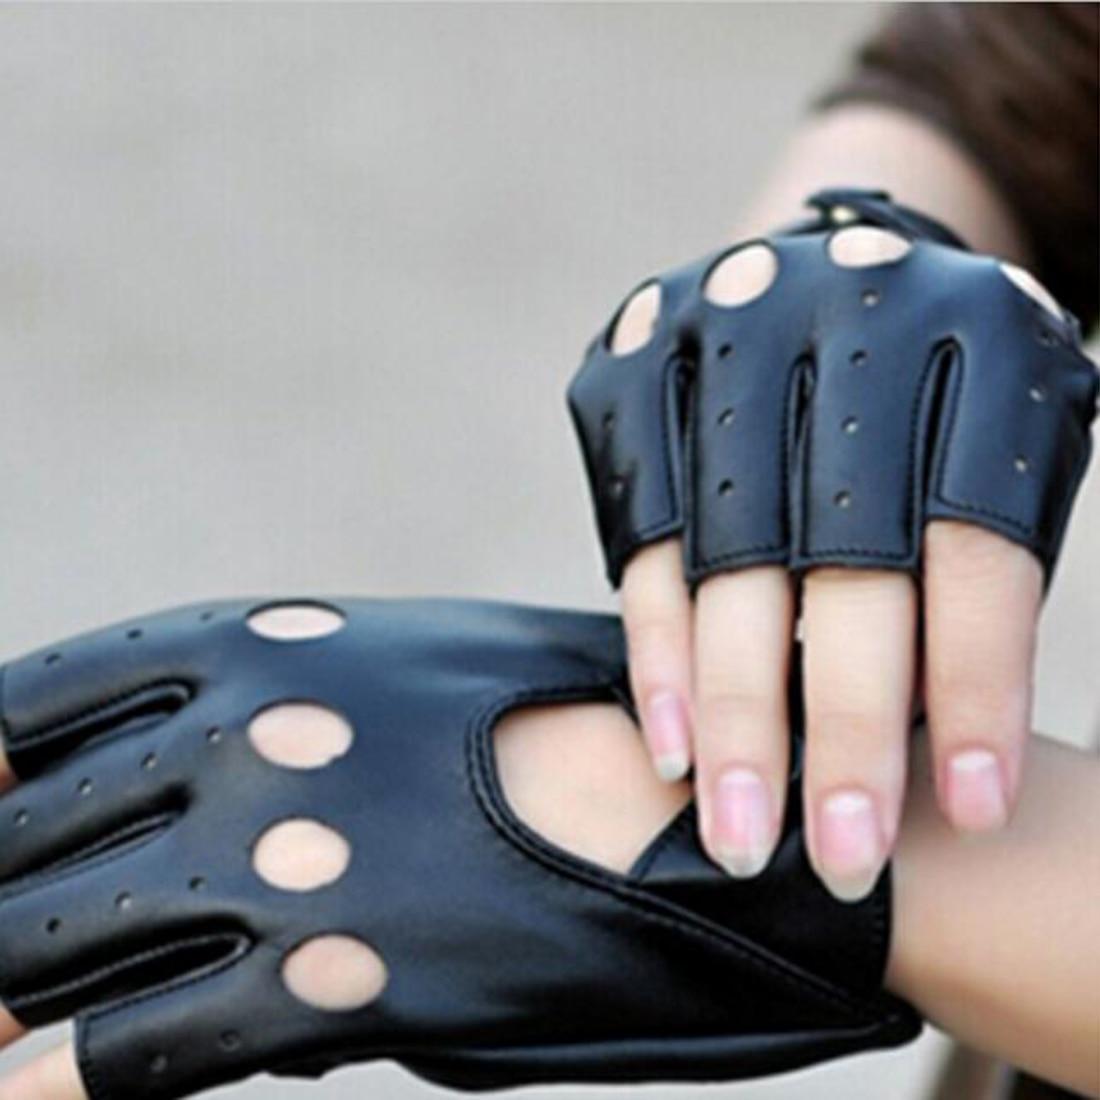 Fahion 1Pair Half Finger Driving Women Fashion Gloves Pu Leather Fingerless Gloves Black Womens Hand Mittens Luvas fishtail braid with hair accessory